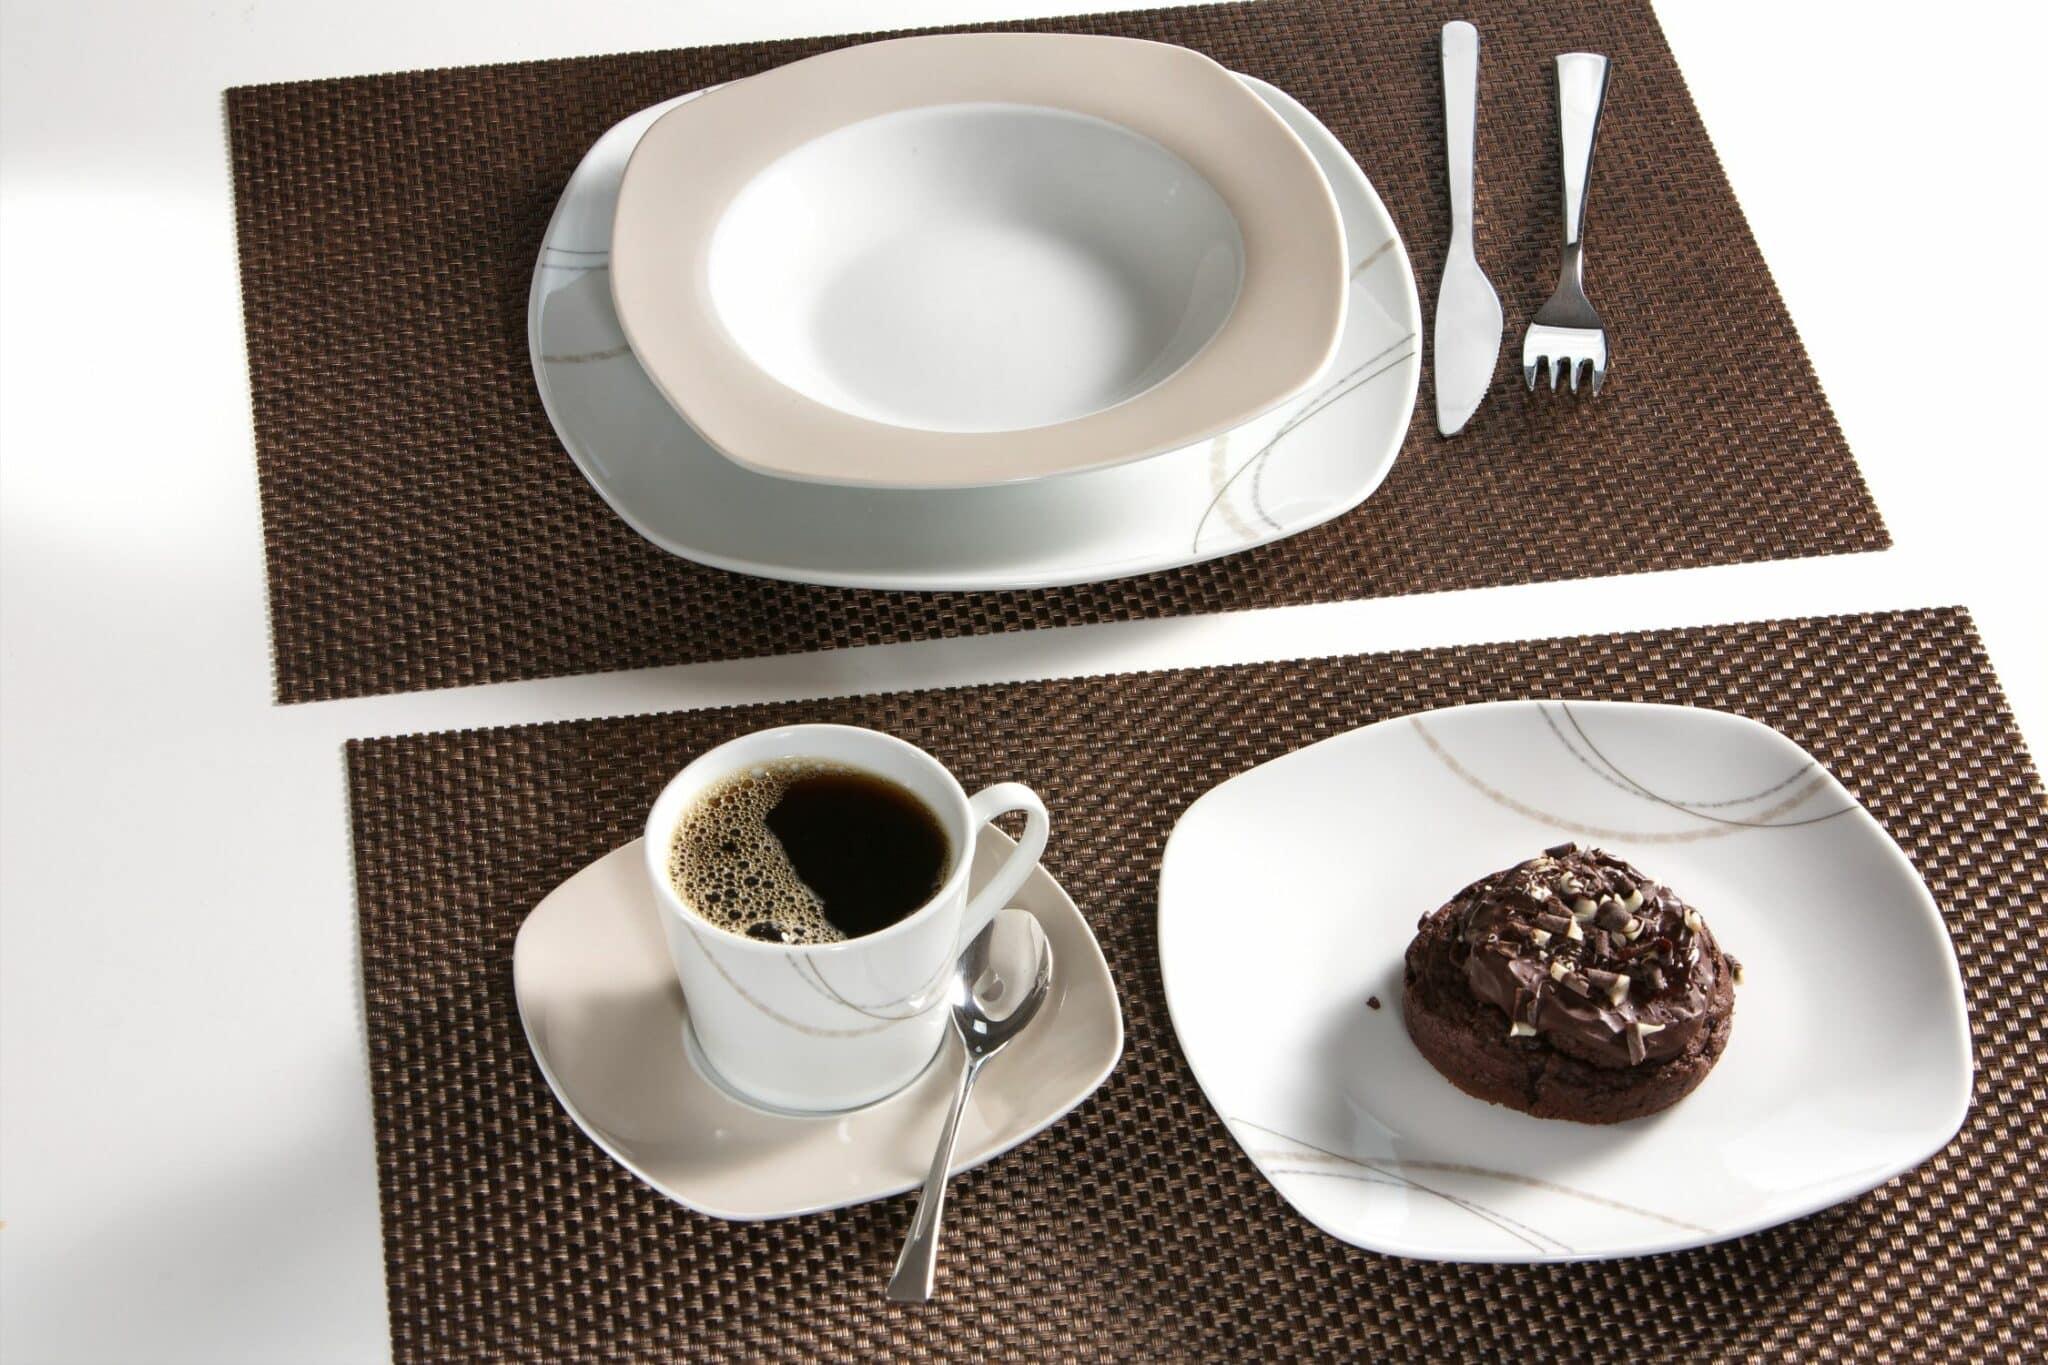 ritzenhoff breker komplett set kombiservice porzellan serie linda 30 tlg ebay. Black Bedroom Furniture Sets. Home Design Ideas